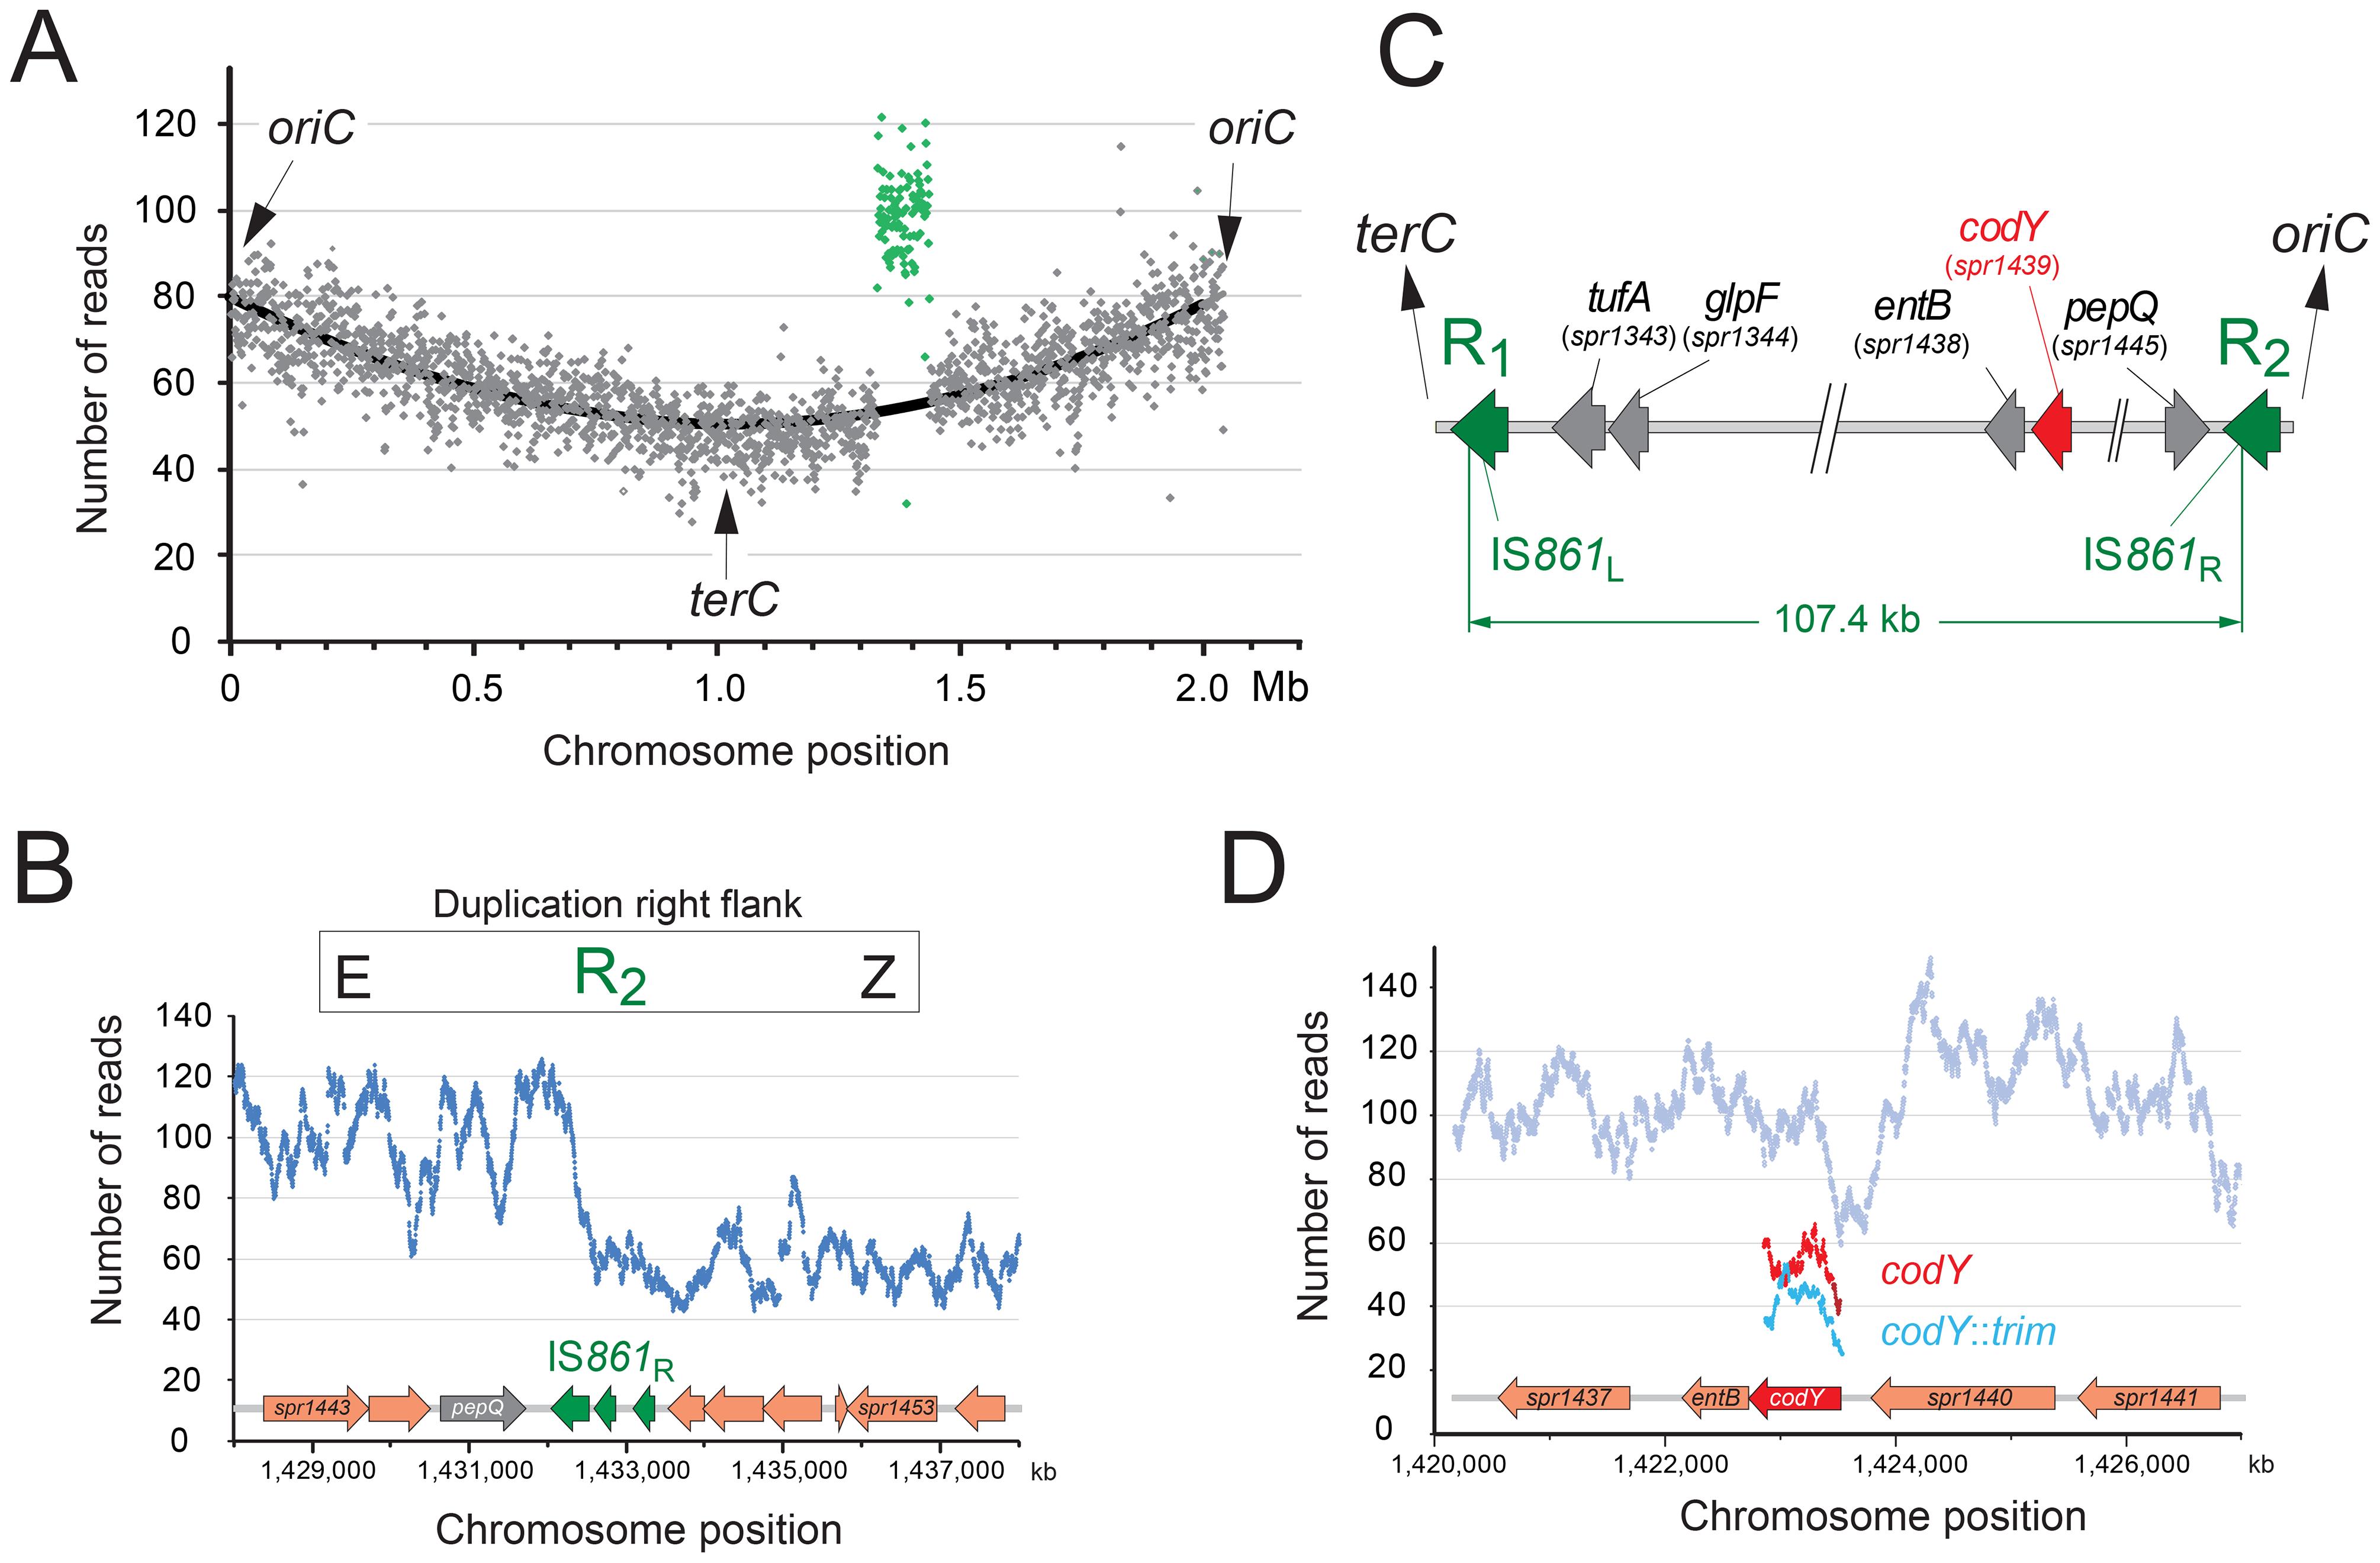 R2597 harbors a duplication of the <i>codY</i> chromosomal region.